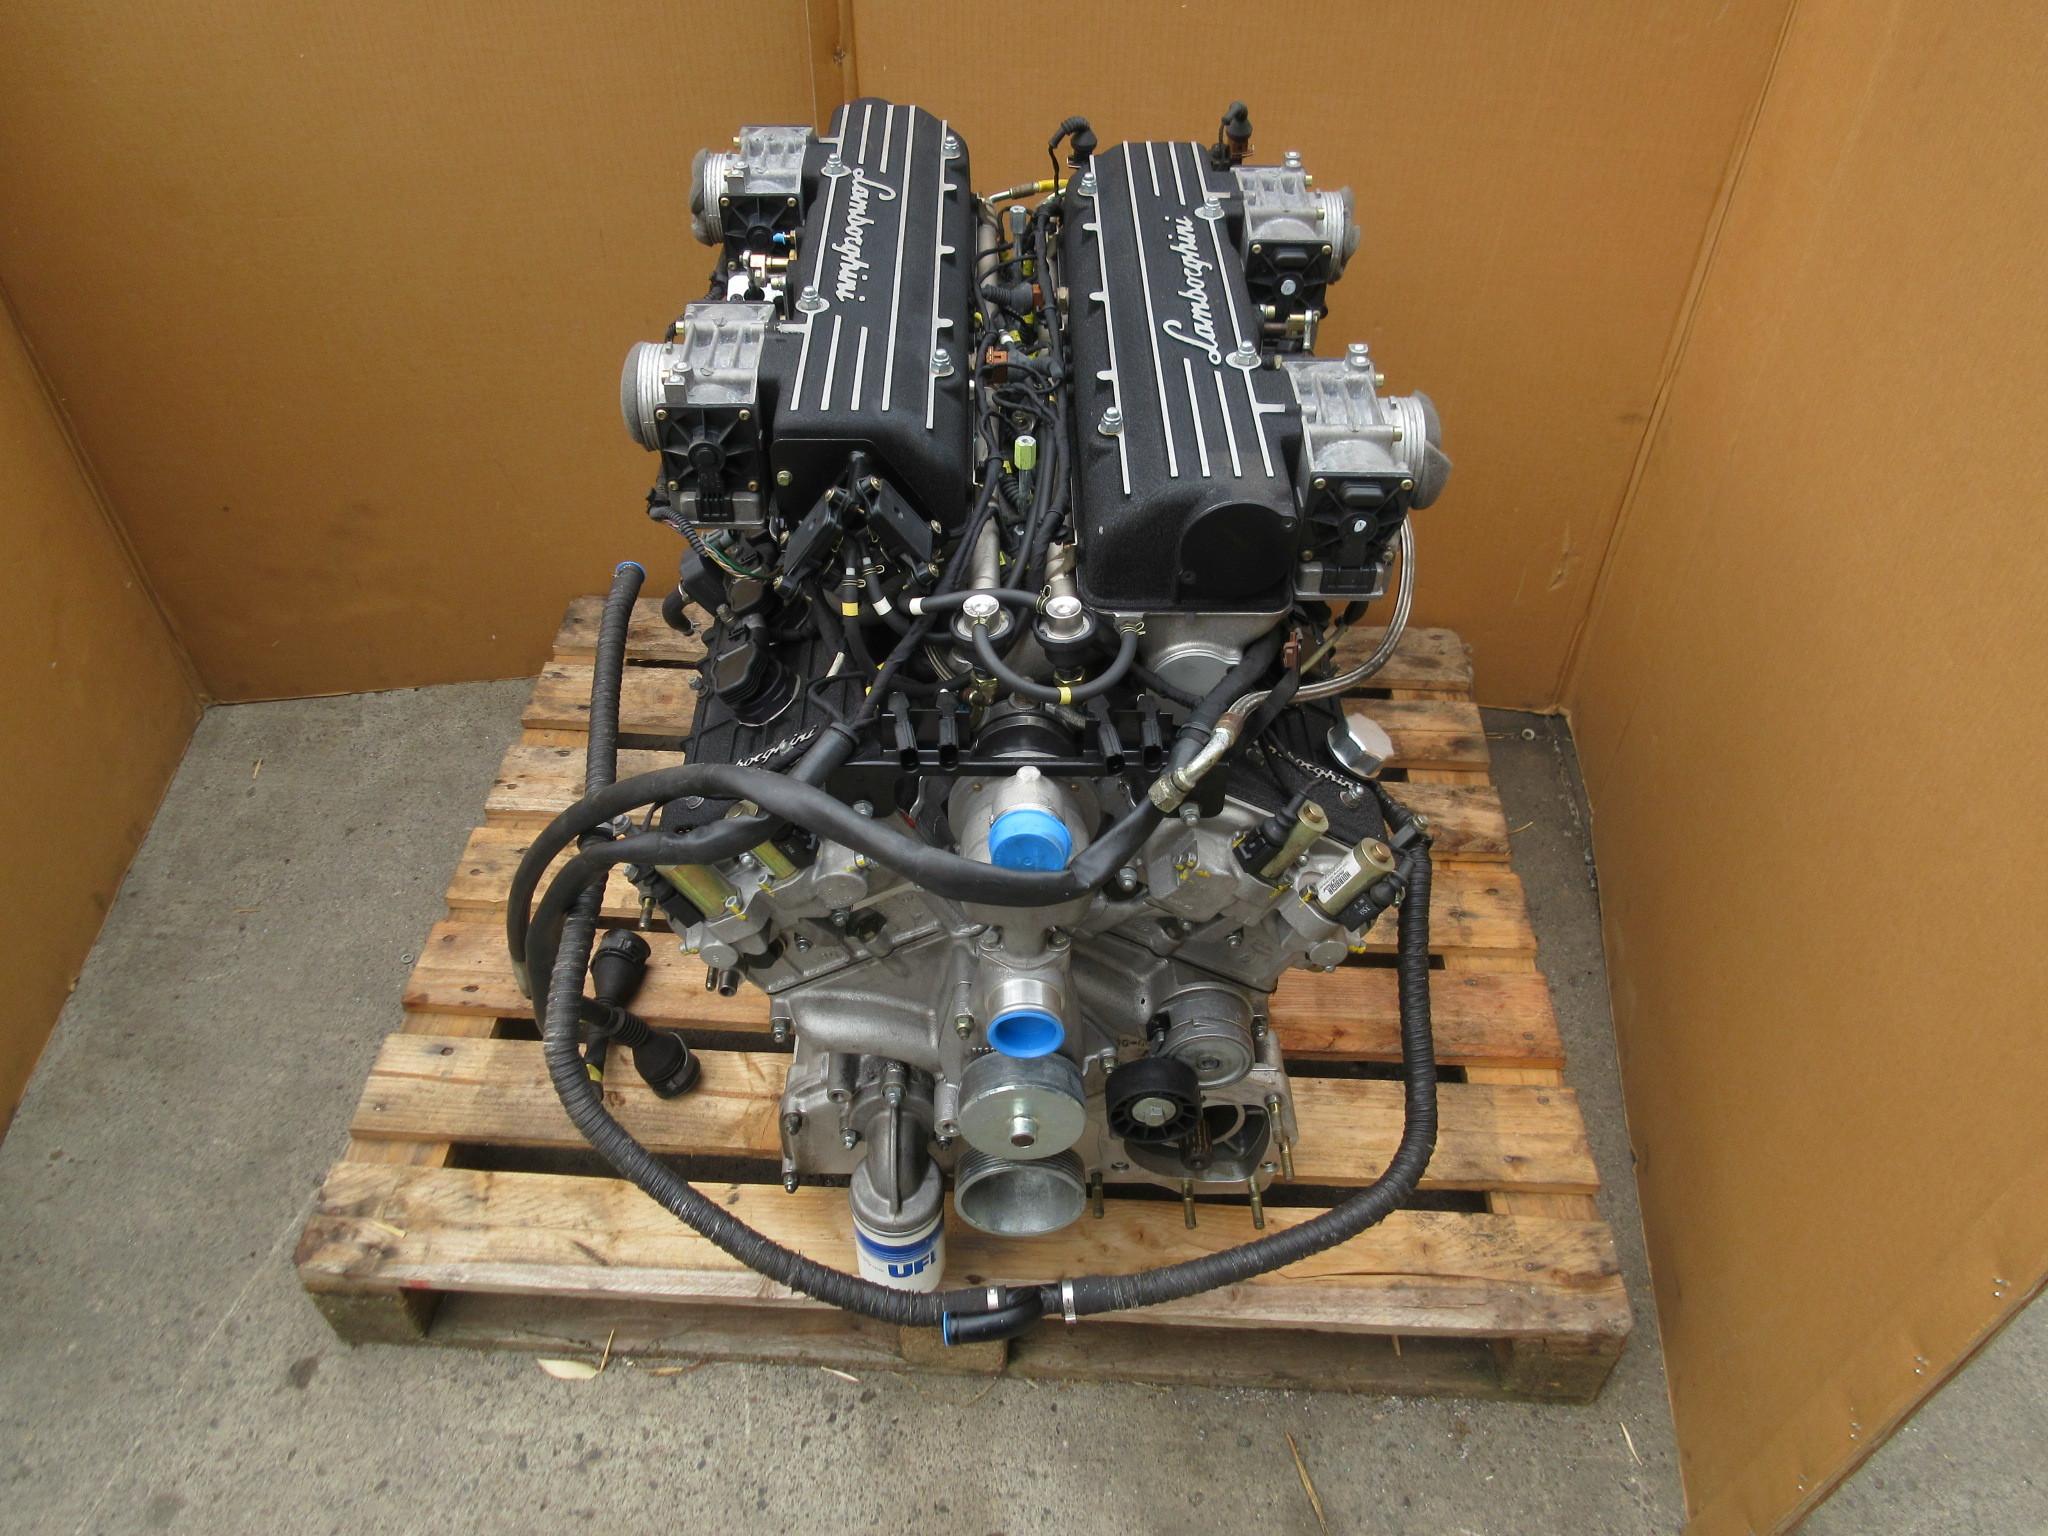 12k In Miles >> 04 Lamborghini Murcielago 1025 6 2l V12 Complete Engine 12k Miles